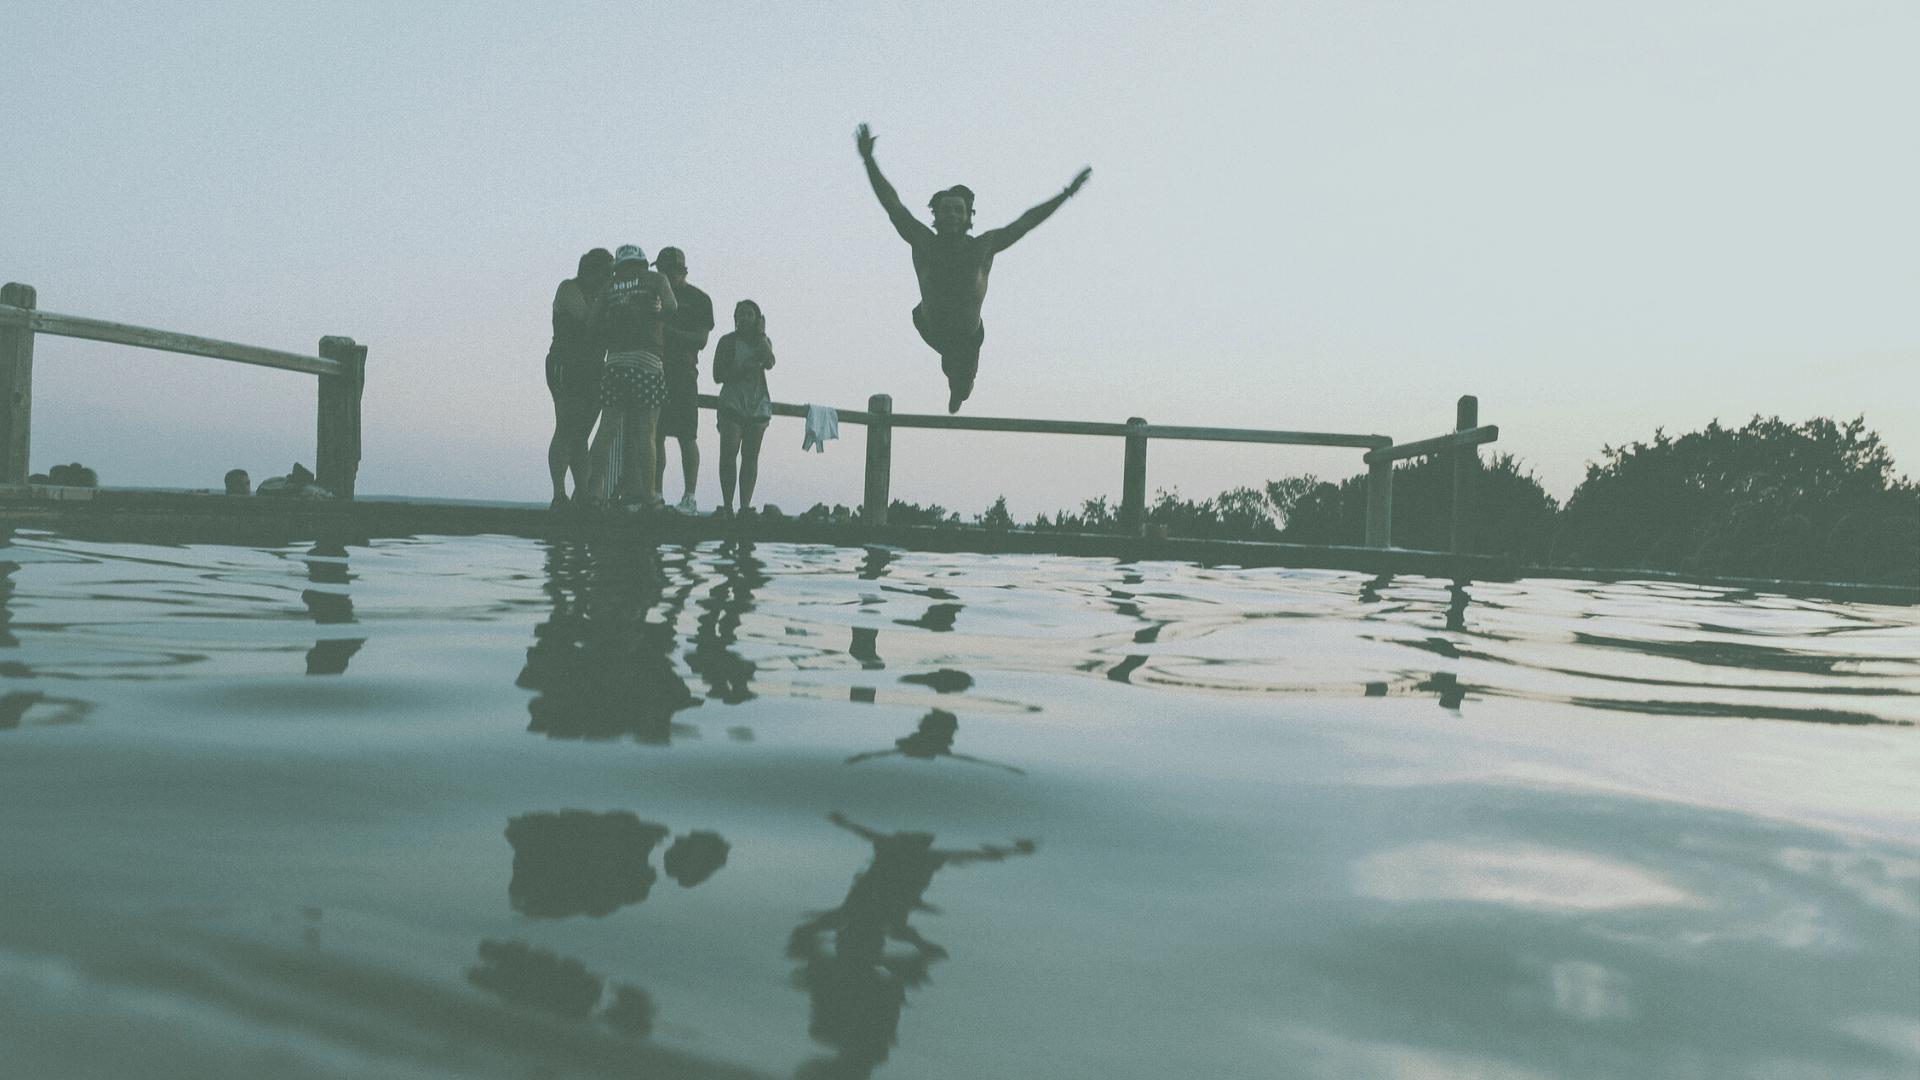 https://laroueetlaplume.fr/wp-content/uploads/2020/01/water-jump.png